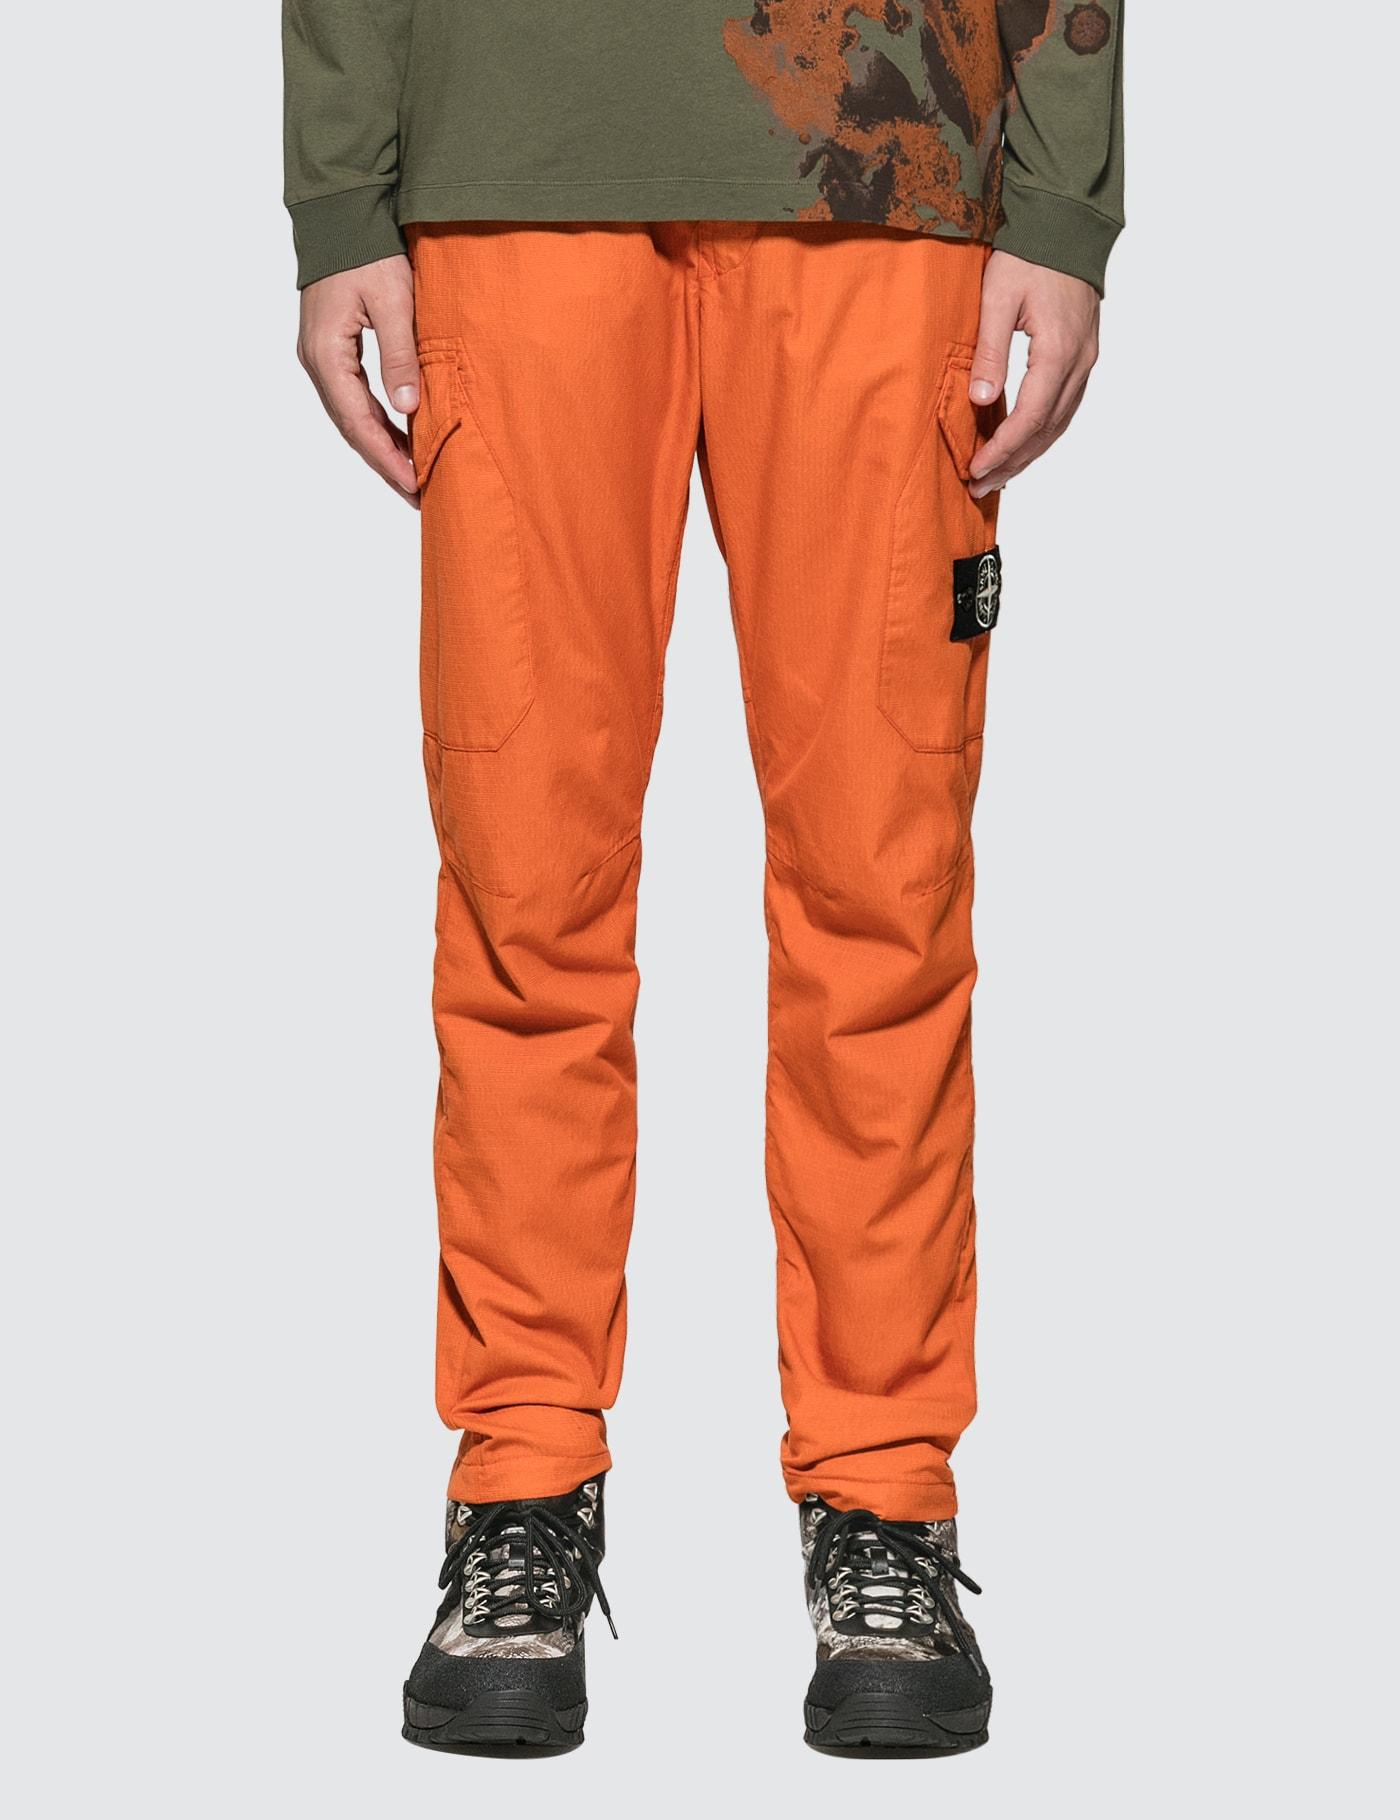 Reflective Weave Ripstop TC Cargo Pants